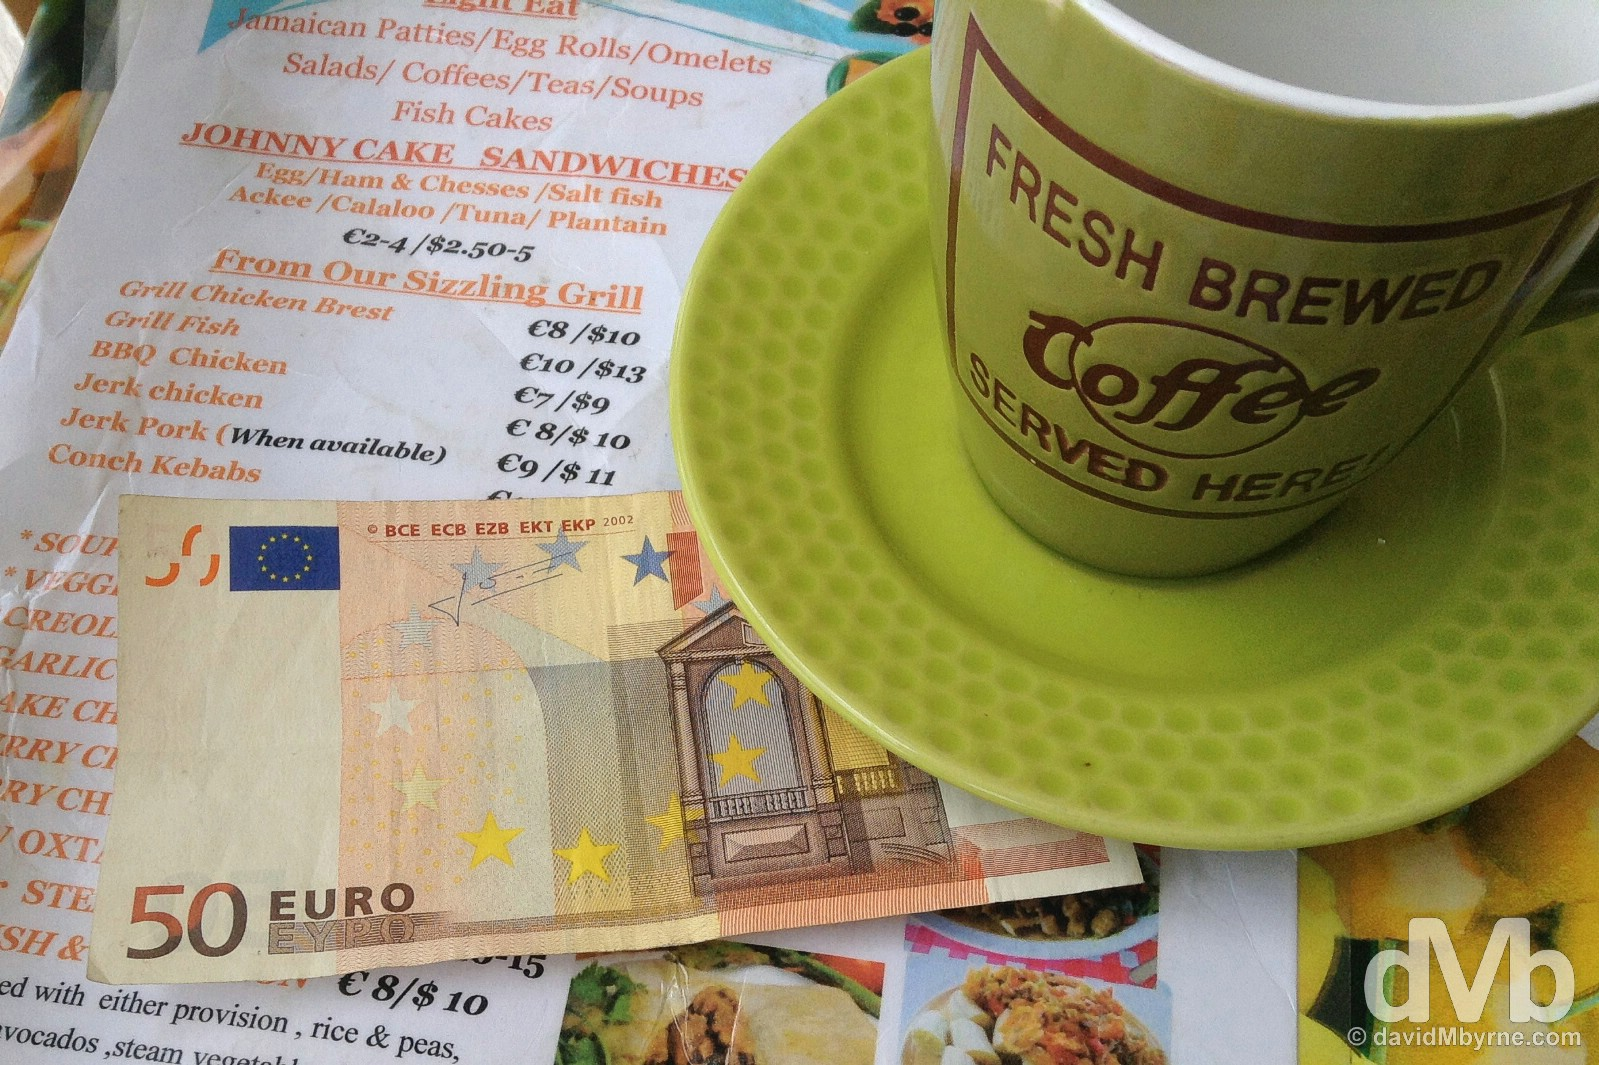 No Euros. Marigot, Saint Martin, Lesser Antilles. June 8, 2015.